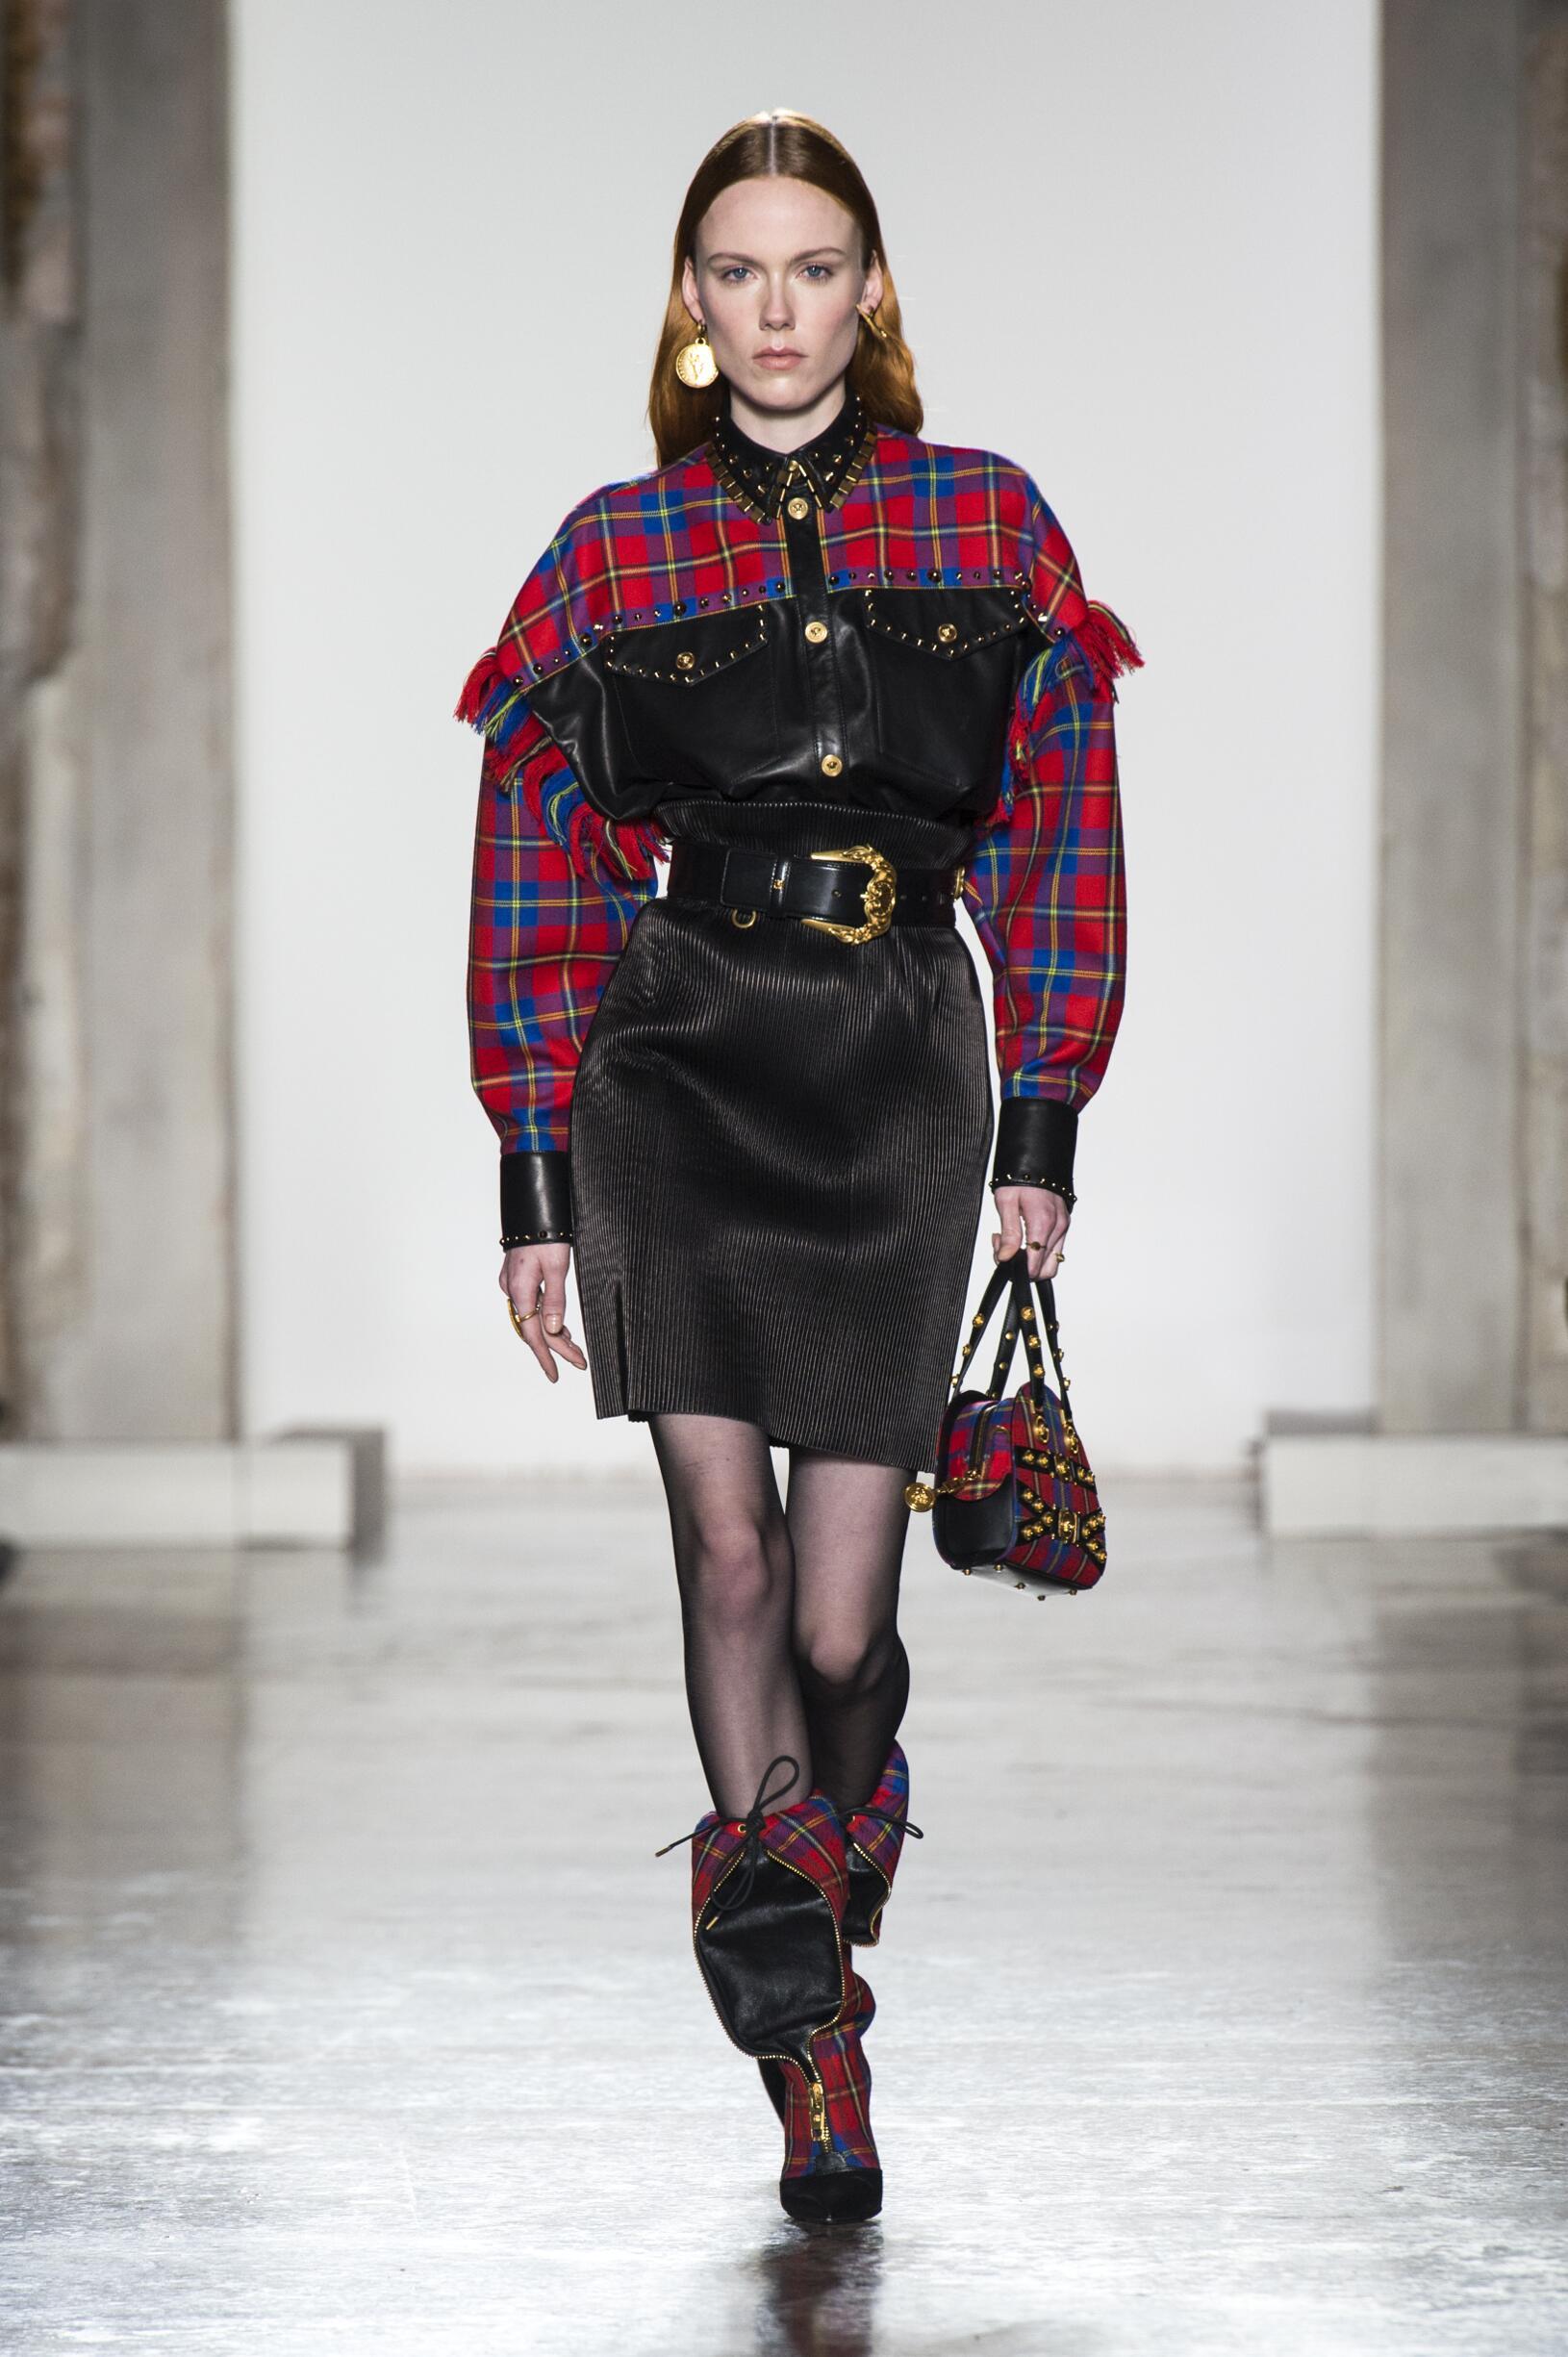 Fashion Model Versace Catwalk